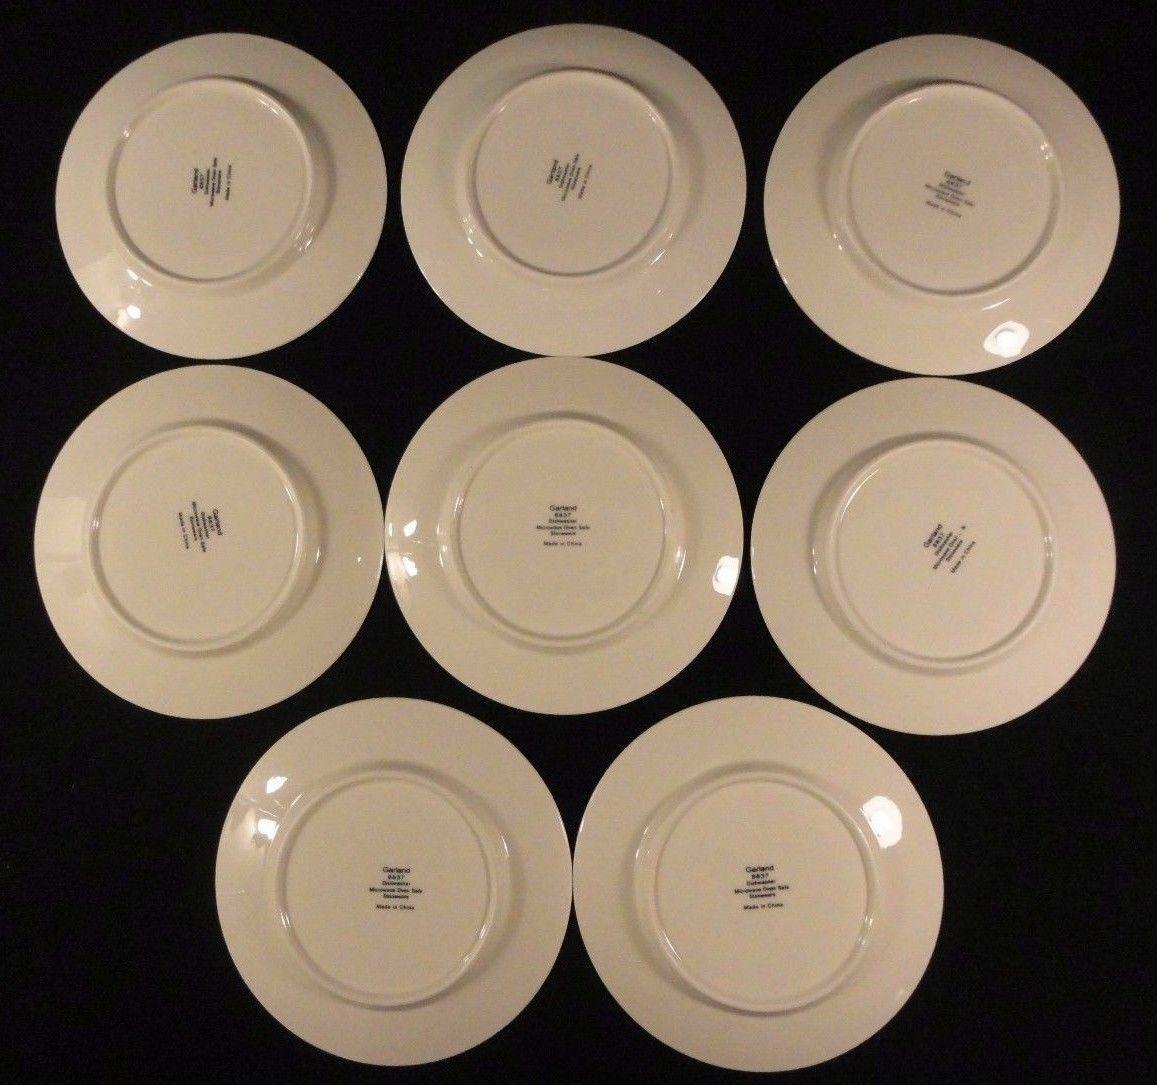 Sango 20pc Garland 8837 Flat Cups Saucers Salt & Pepper Shakers Tea Pot Plate